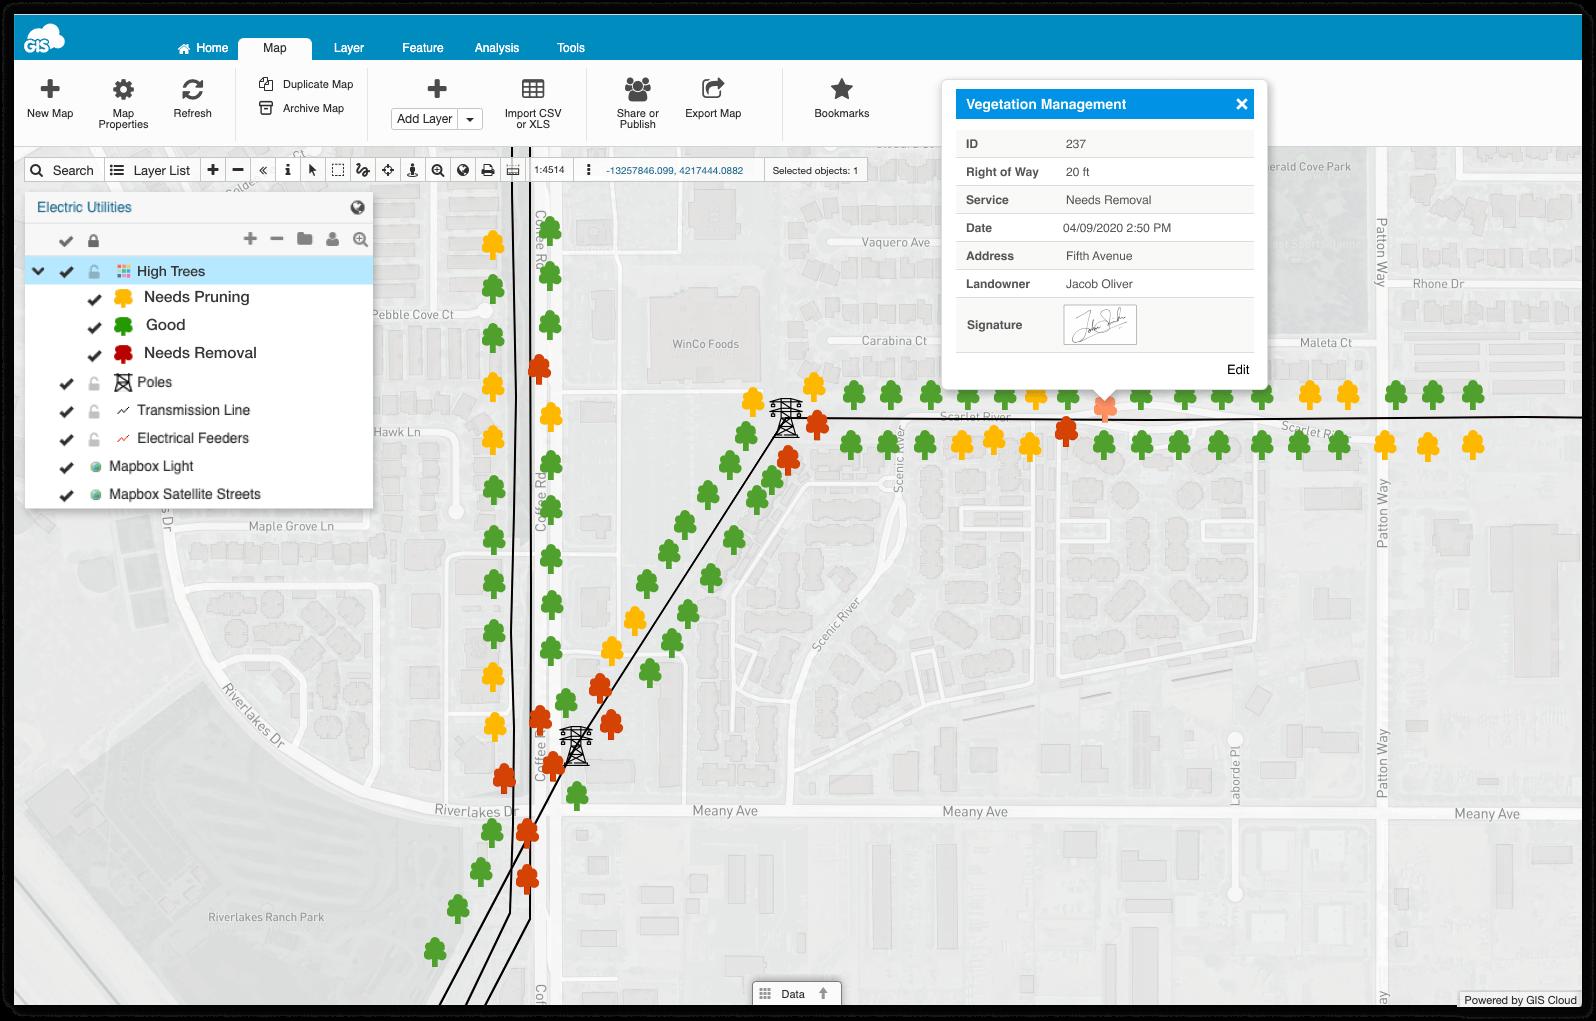 Managing Vegetation Using GIS - Map Editor